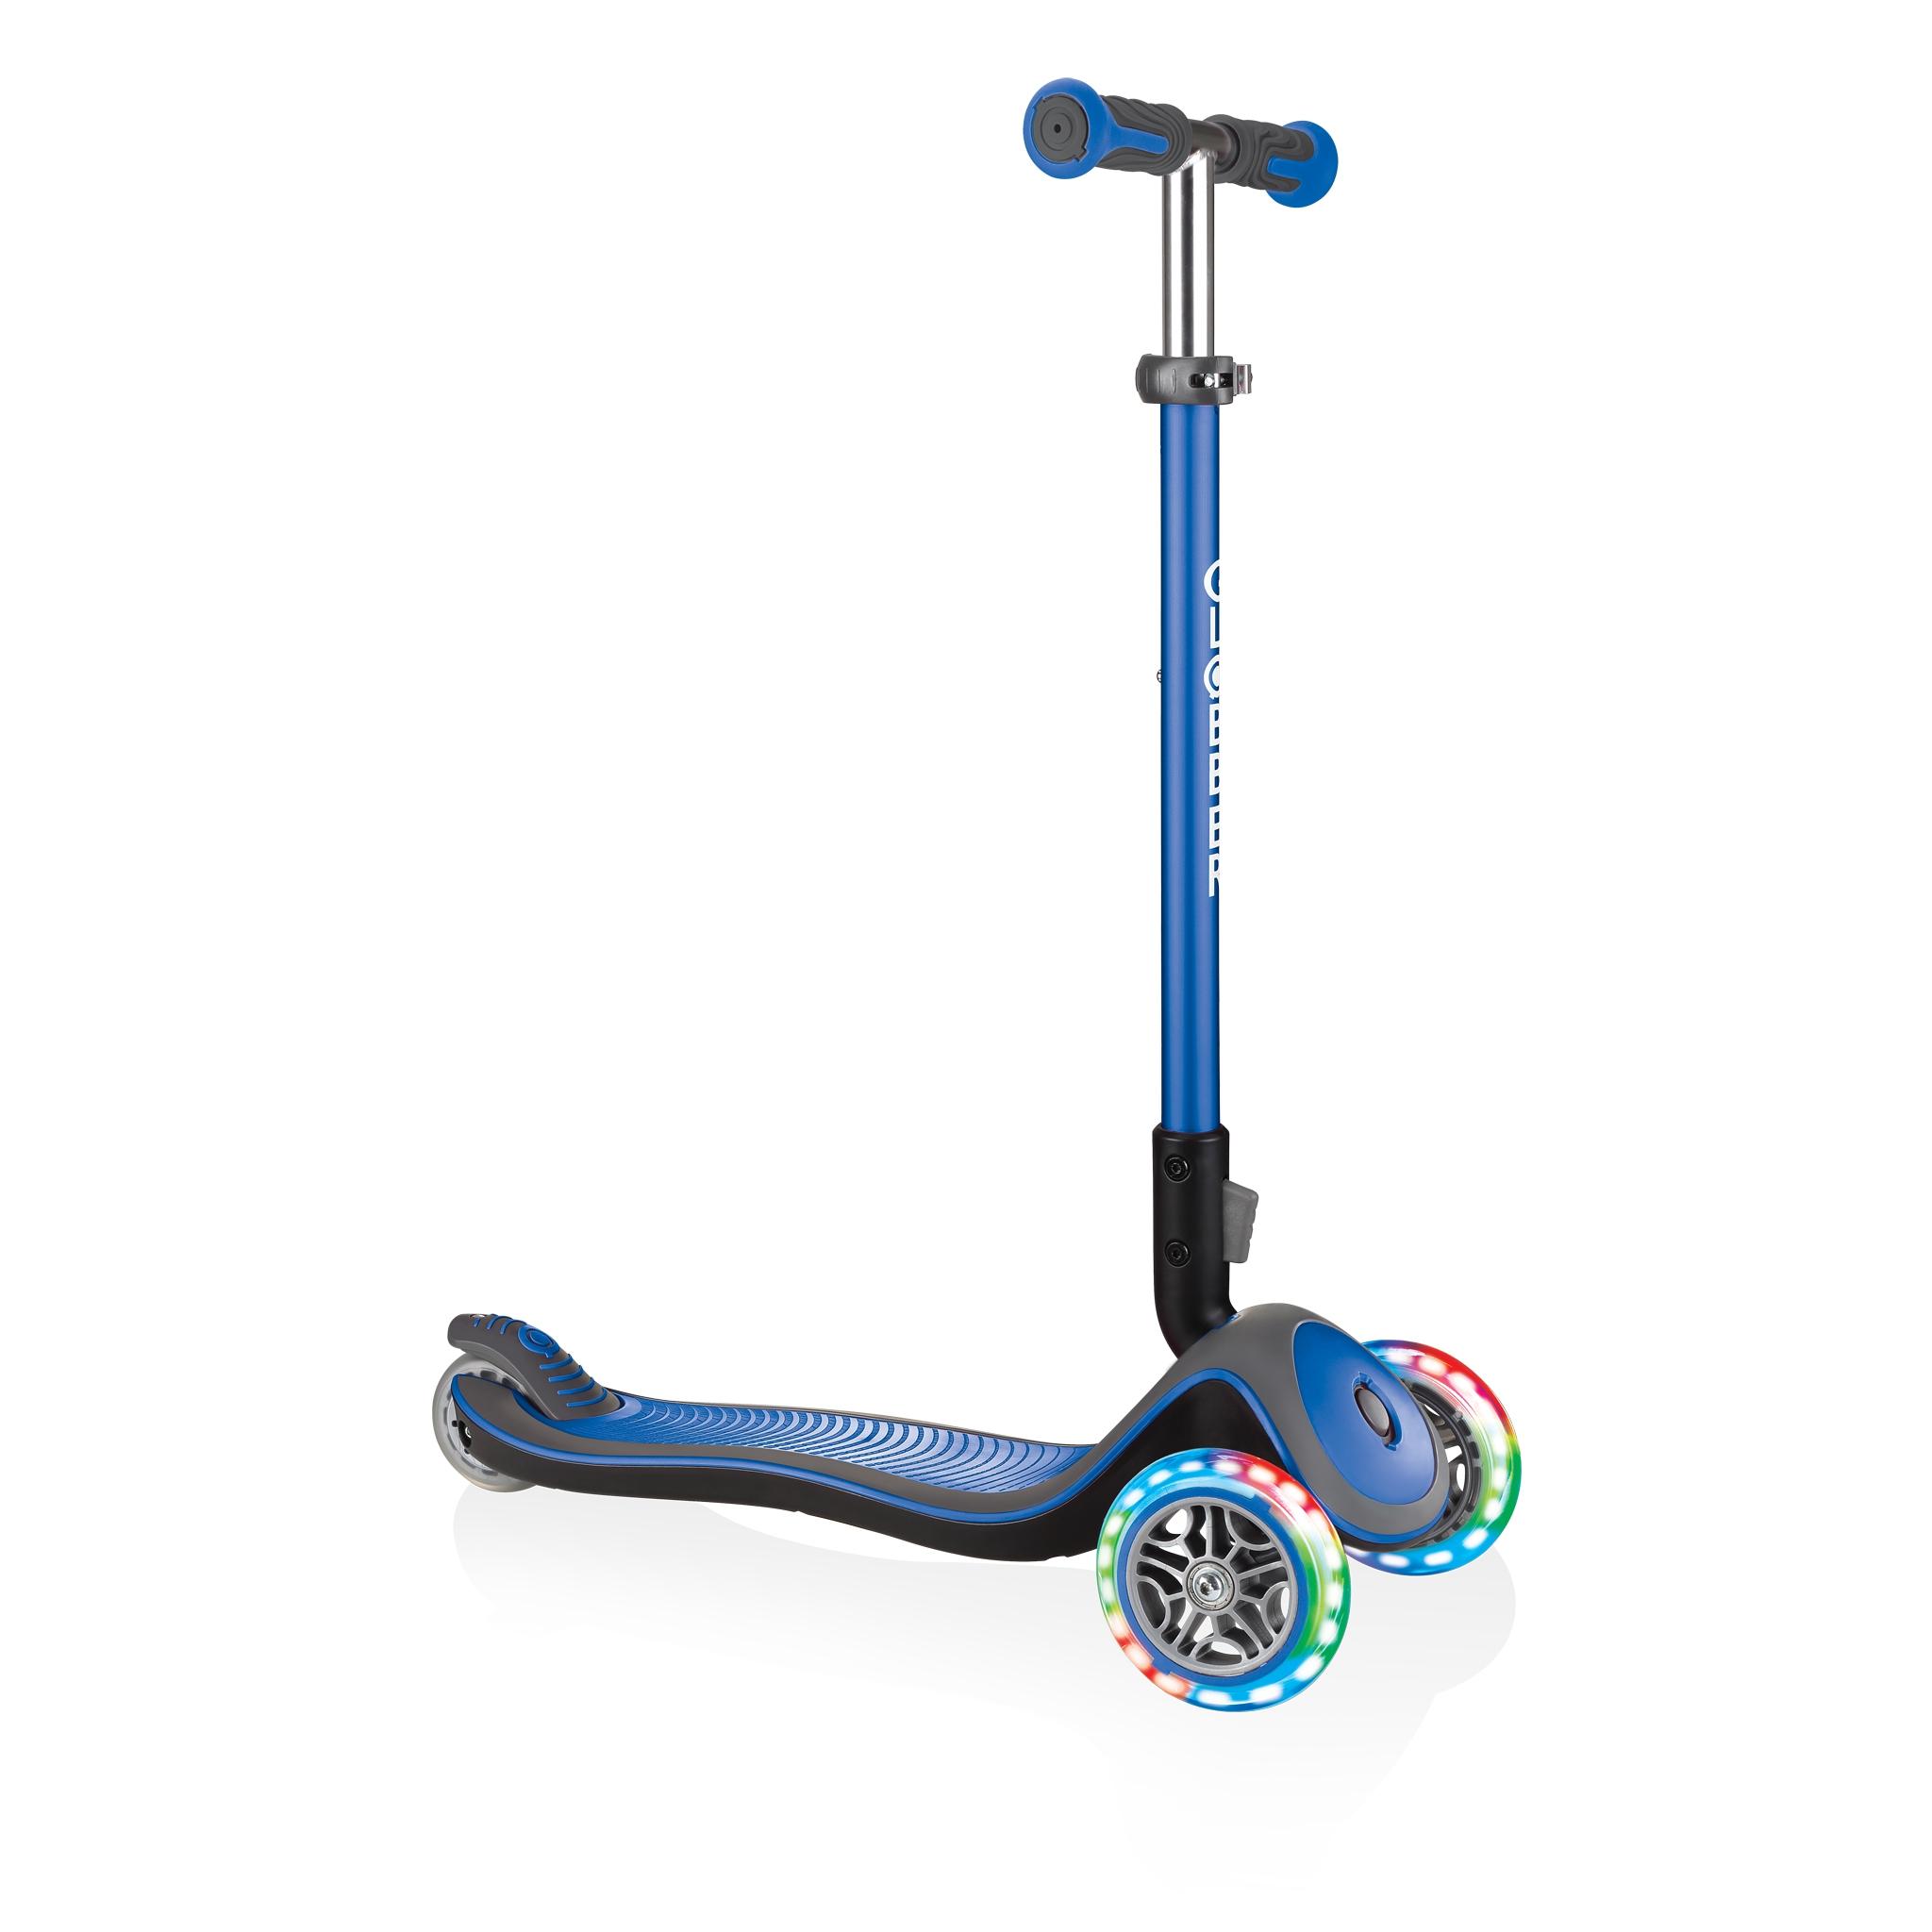 Globber-ELITE-DELUXE-LIGHTS-Best-3-wheel-light-up-scooter-for-kids-aged-3+-navy-blue